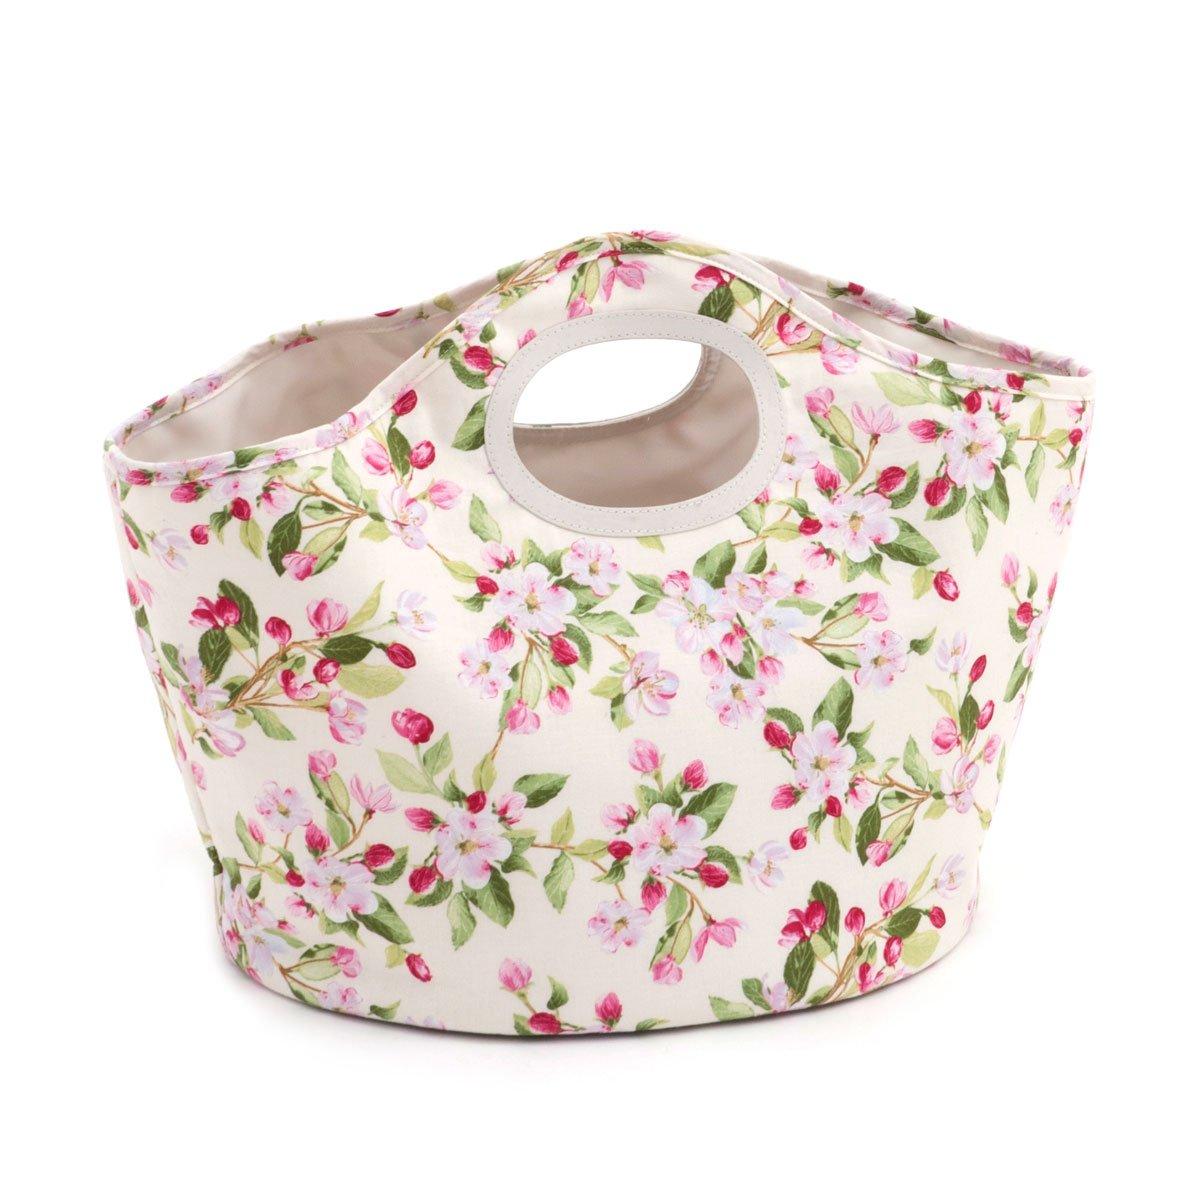 Hobby Gift 'Apple Blossom Festival' Handheld Tote Bag 26 x 32 x 48cm (d/w/h)